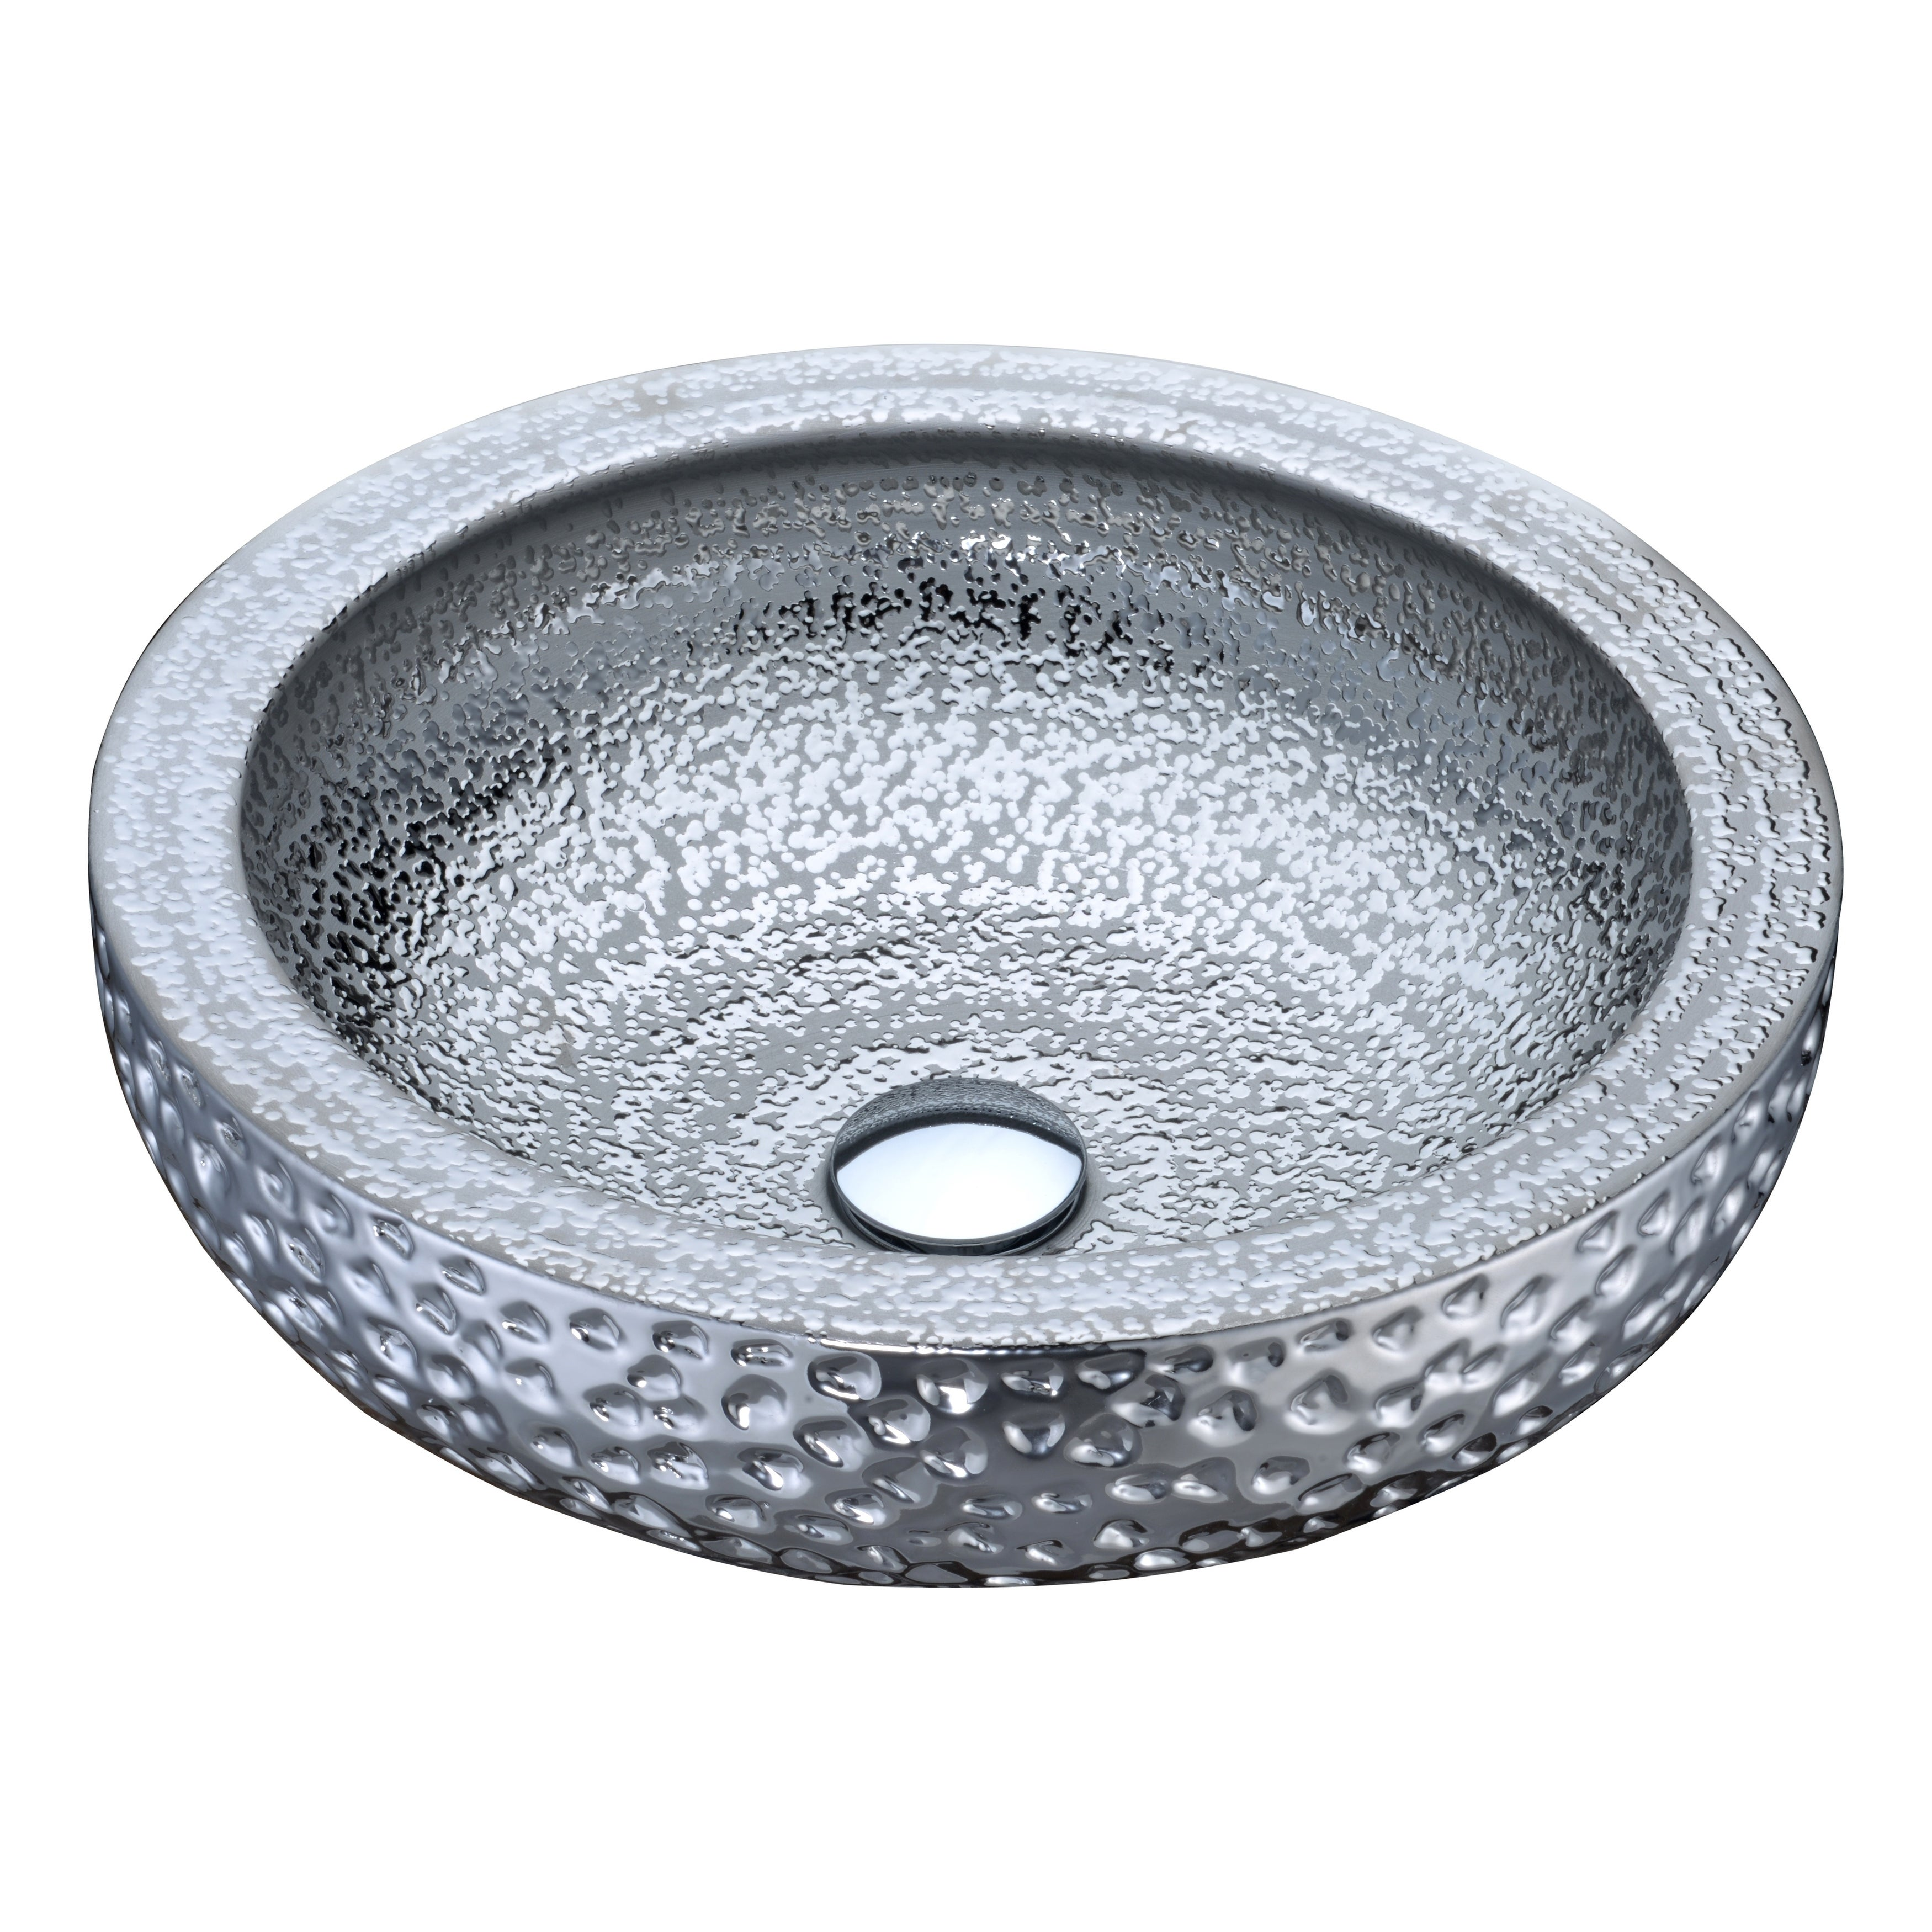 ANZZI Regalia Series Vessel Sink in Speckled Silver (Speckled Silver)